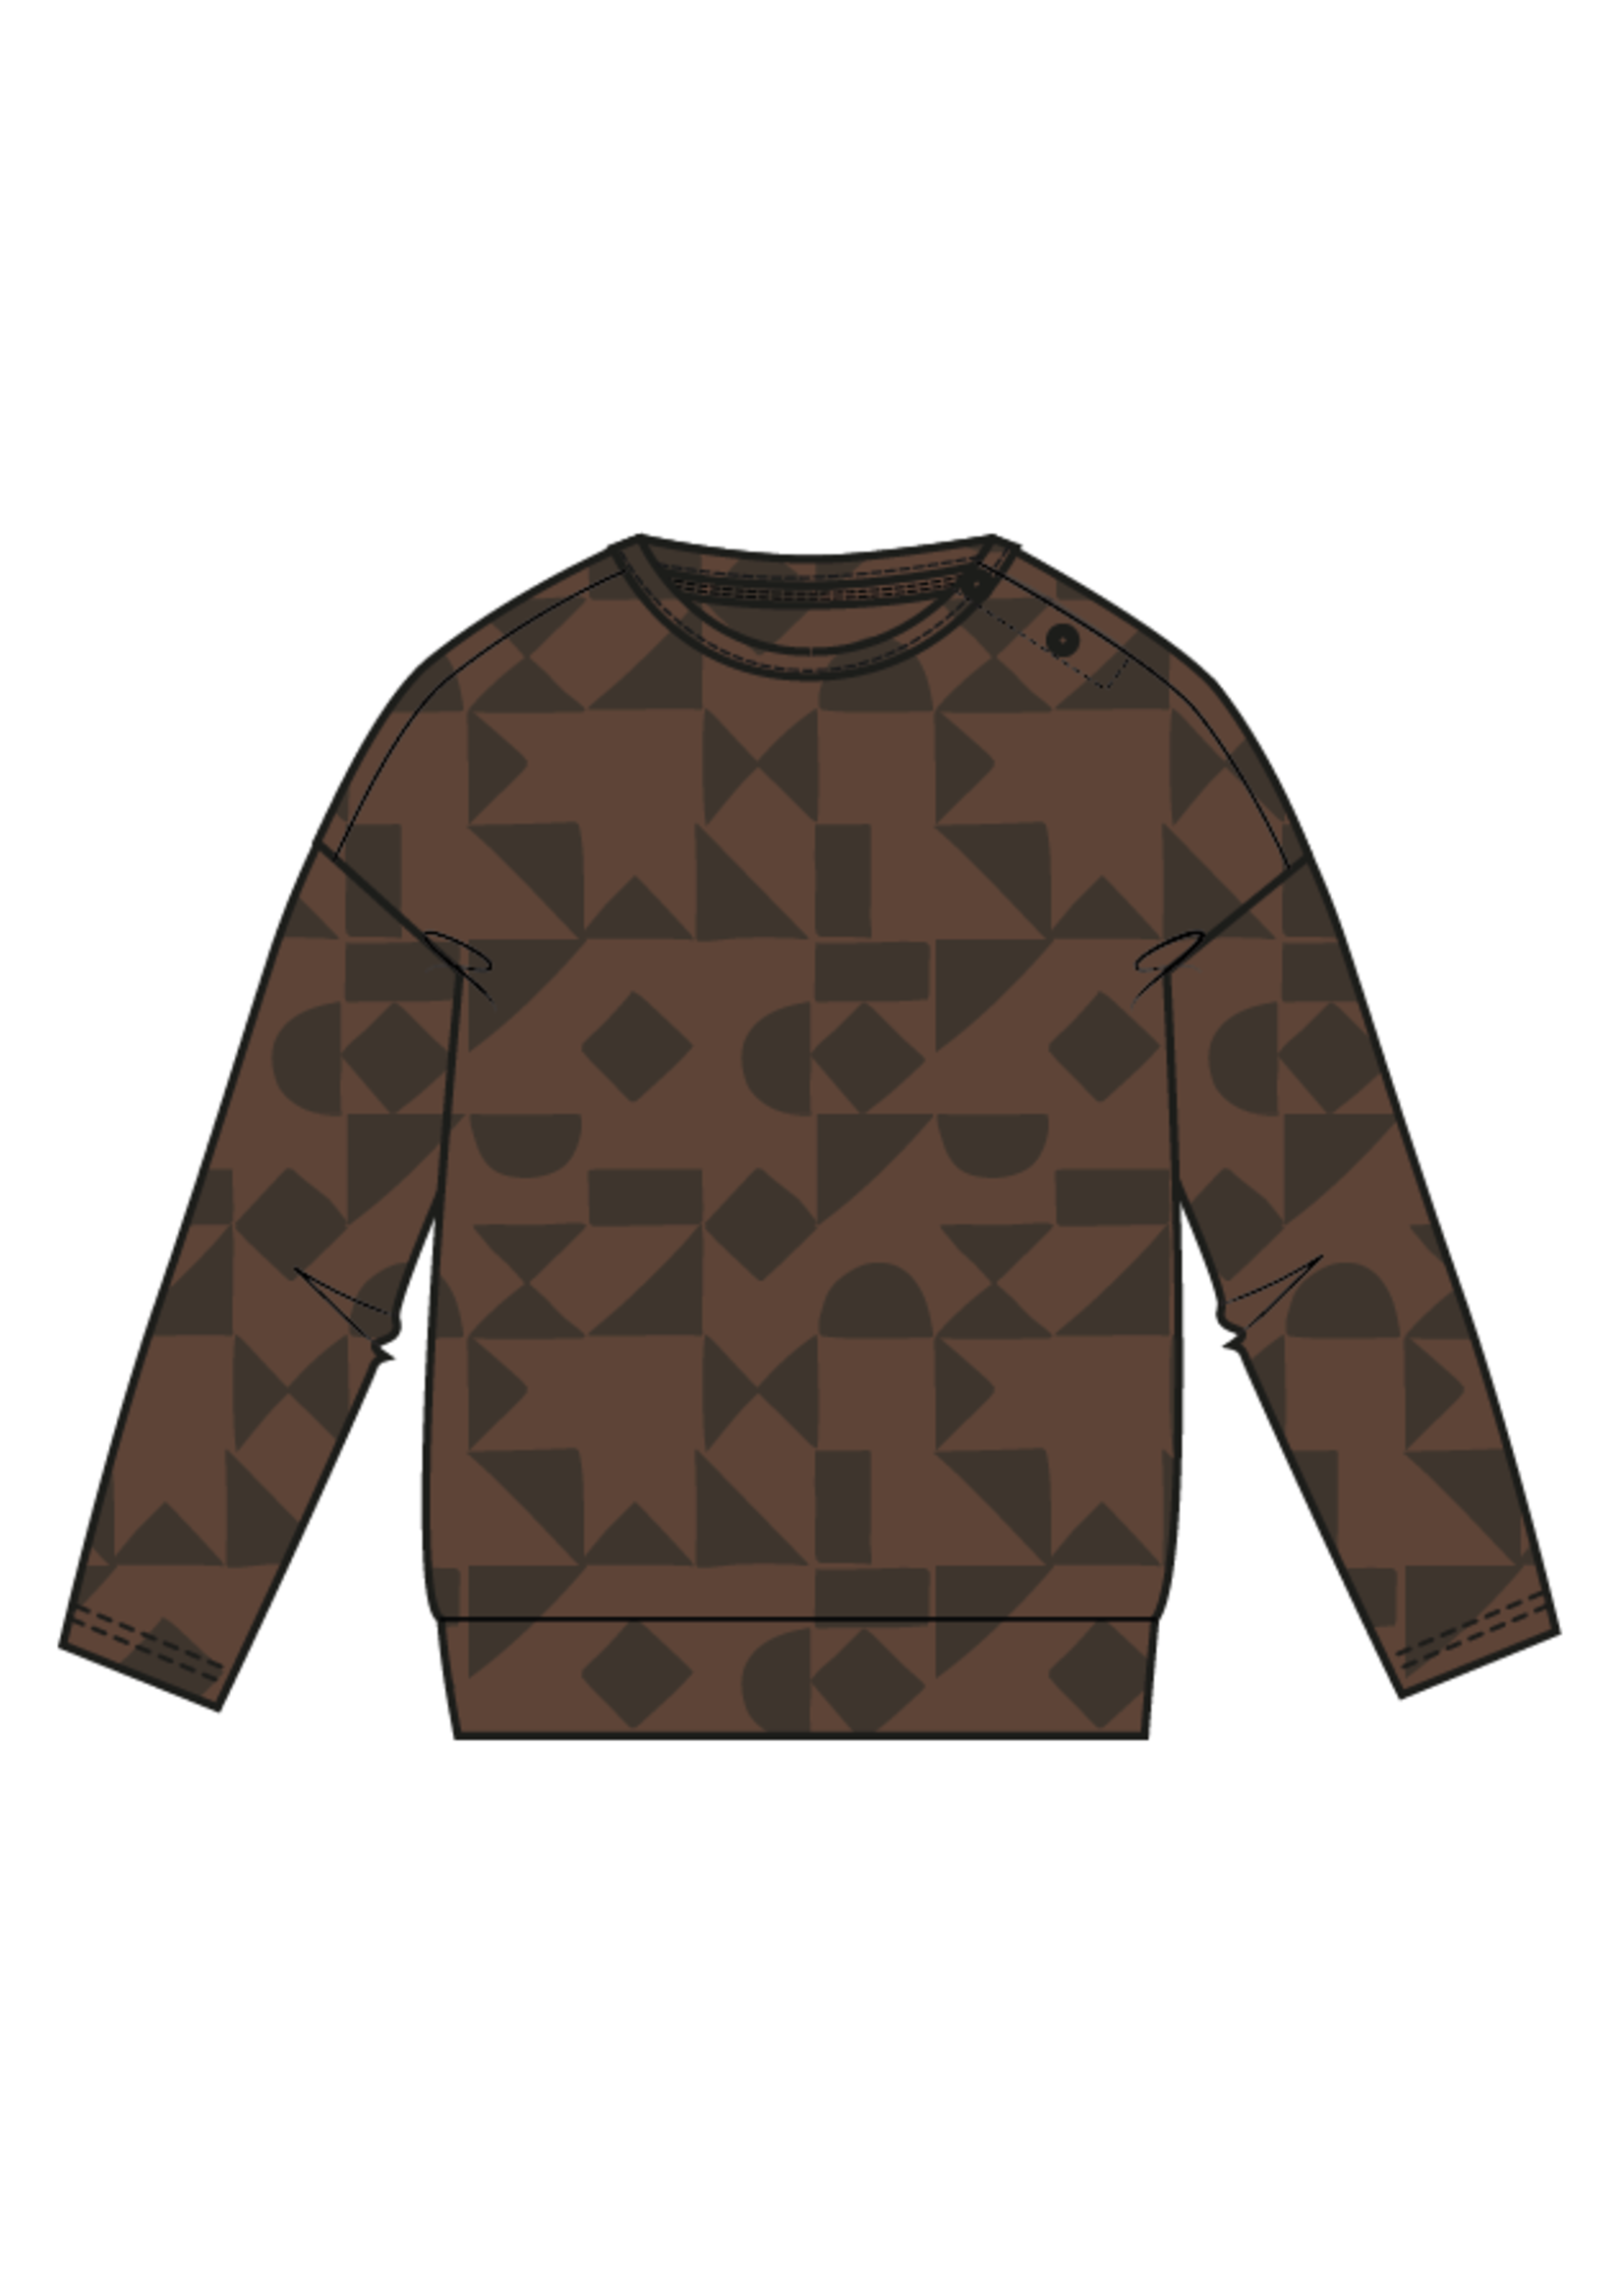 Blossom Kids Sweater - Geometric